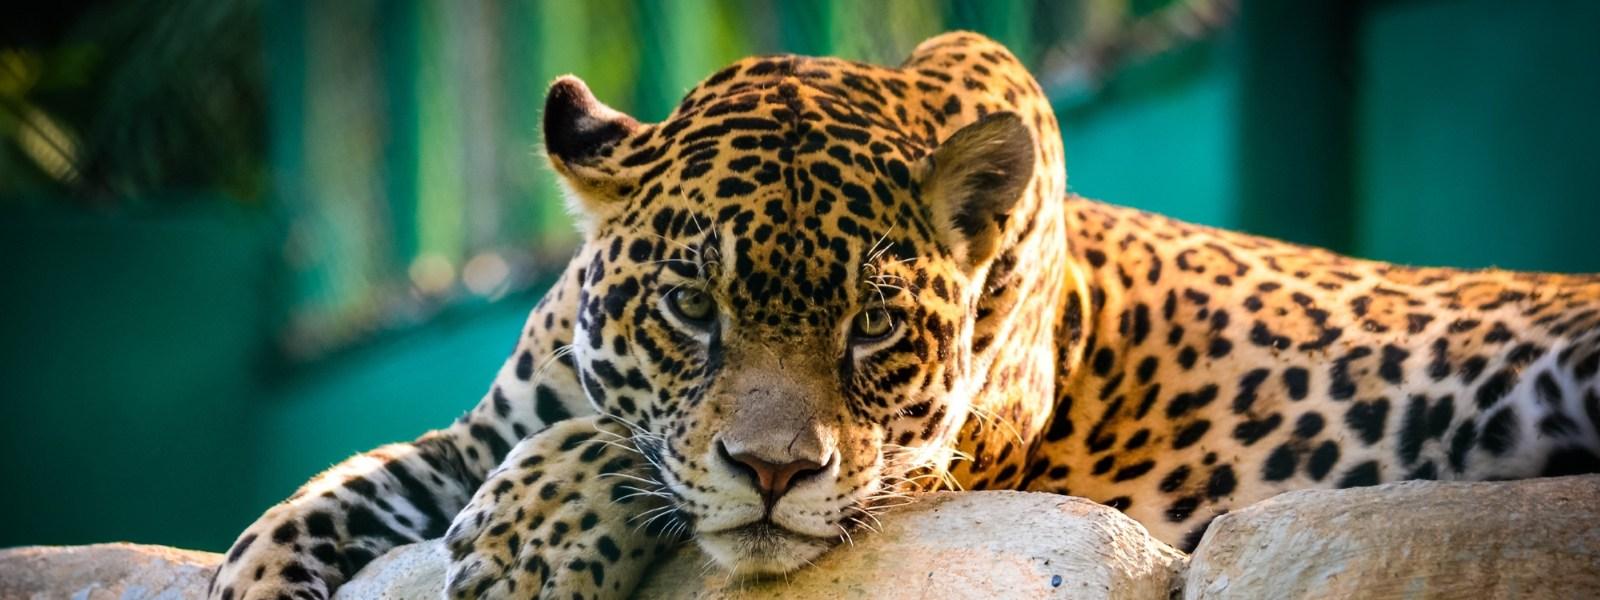 пейзаж 4 гепард на отдыхе